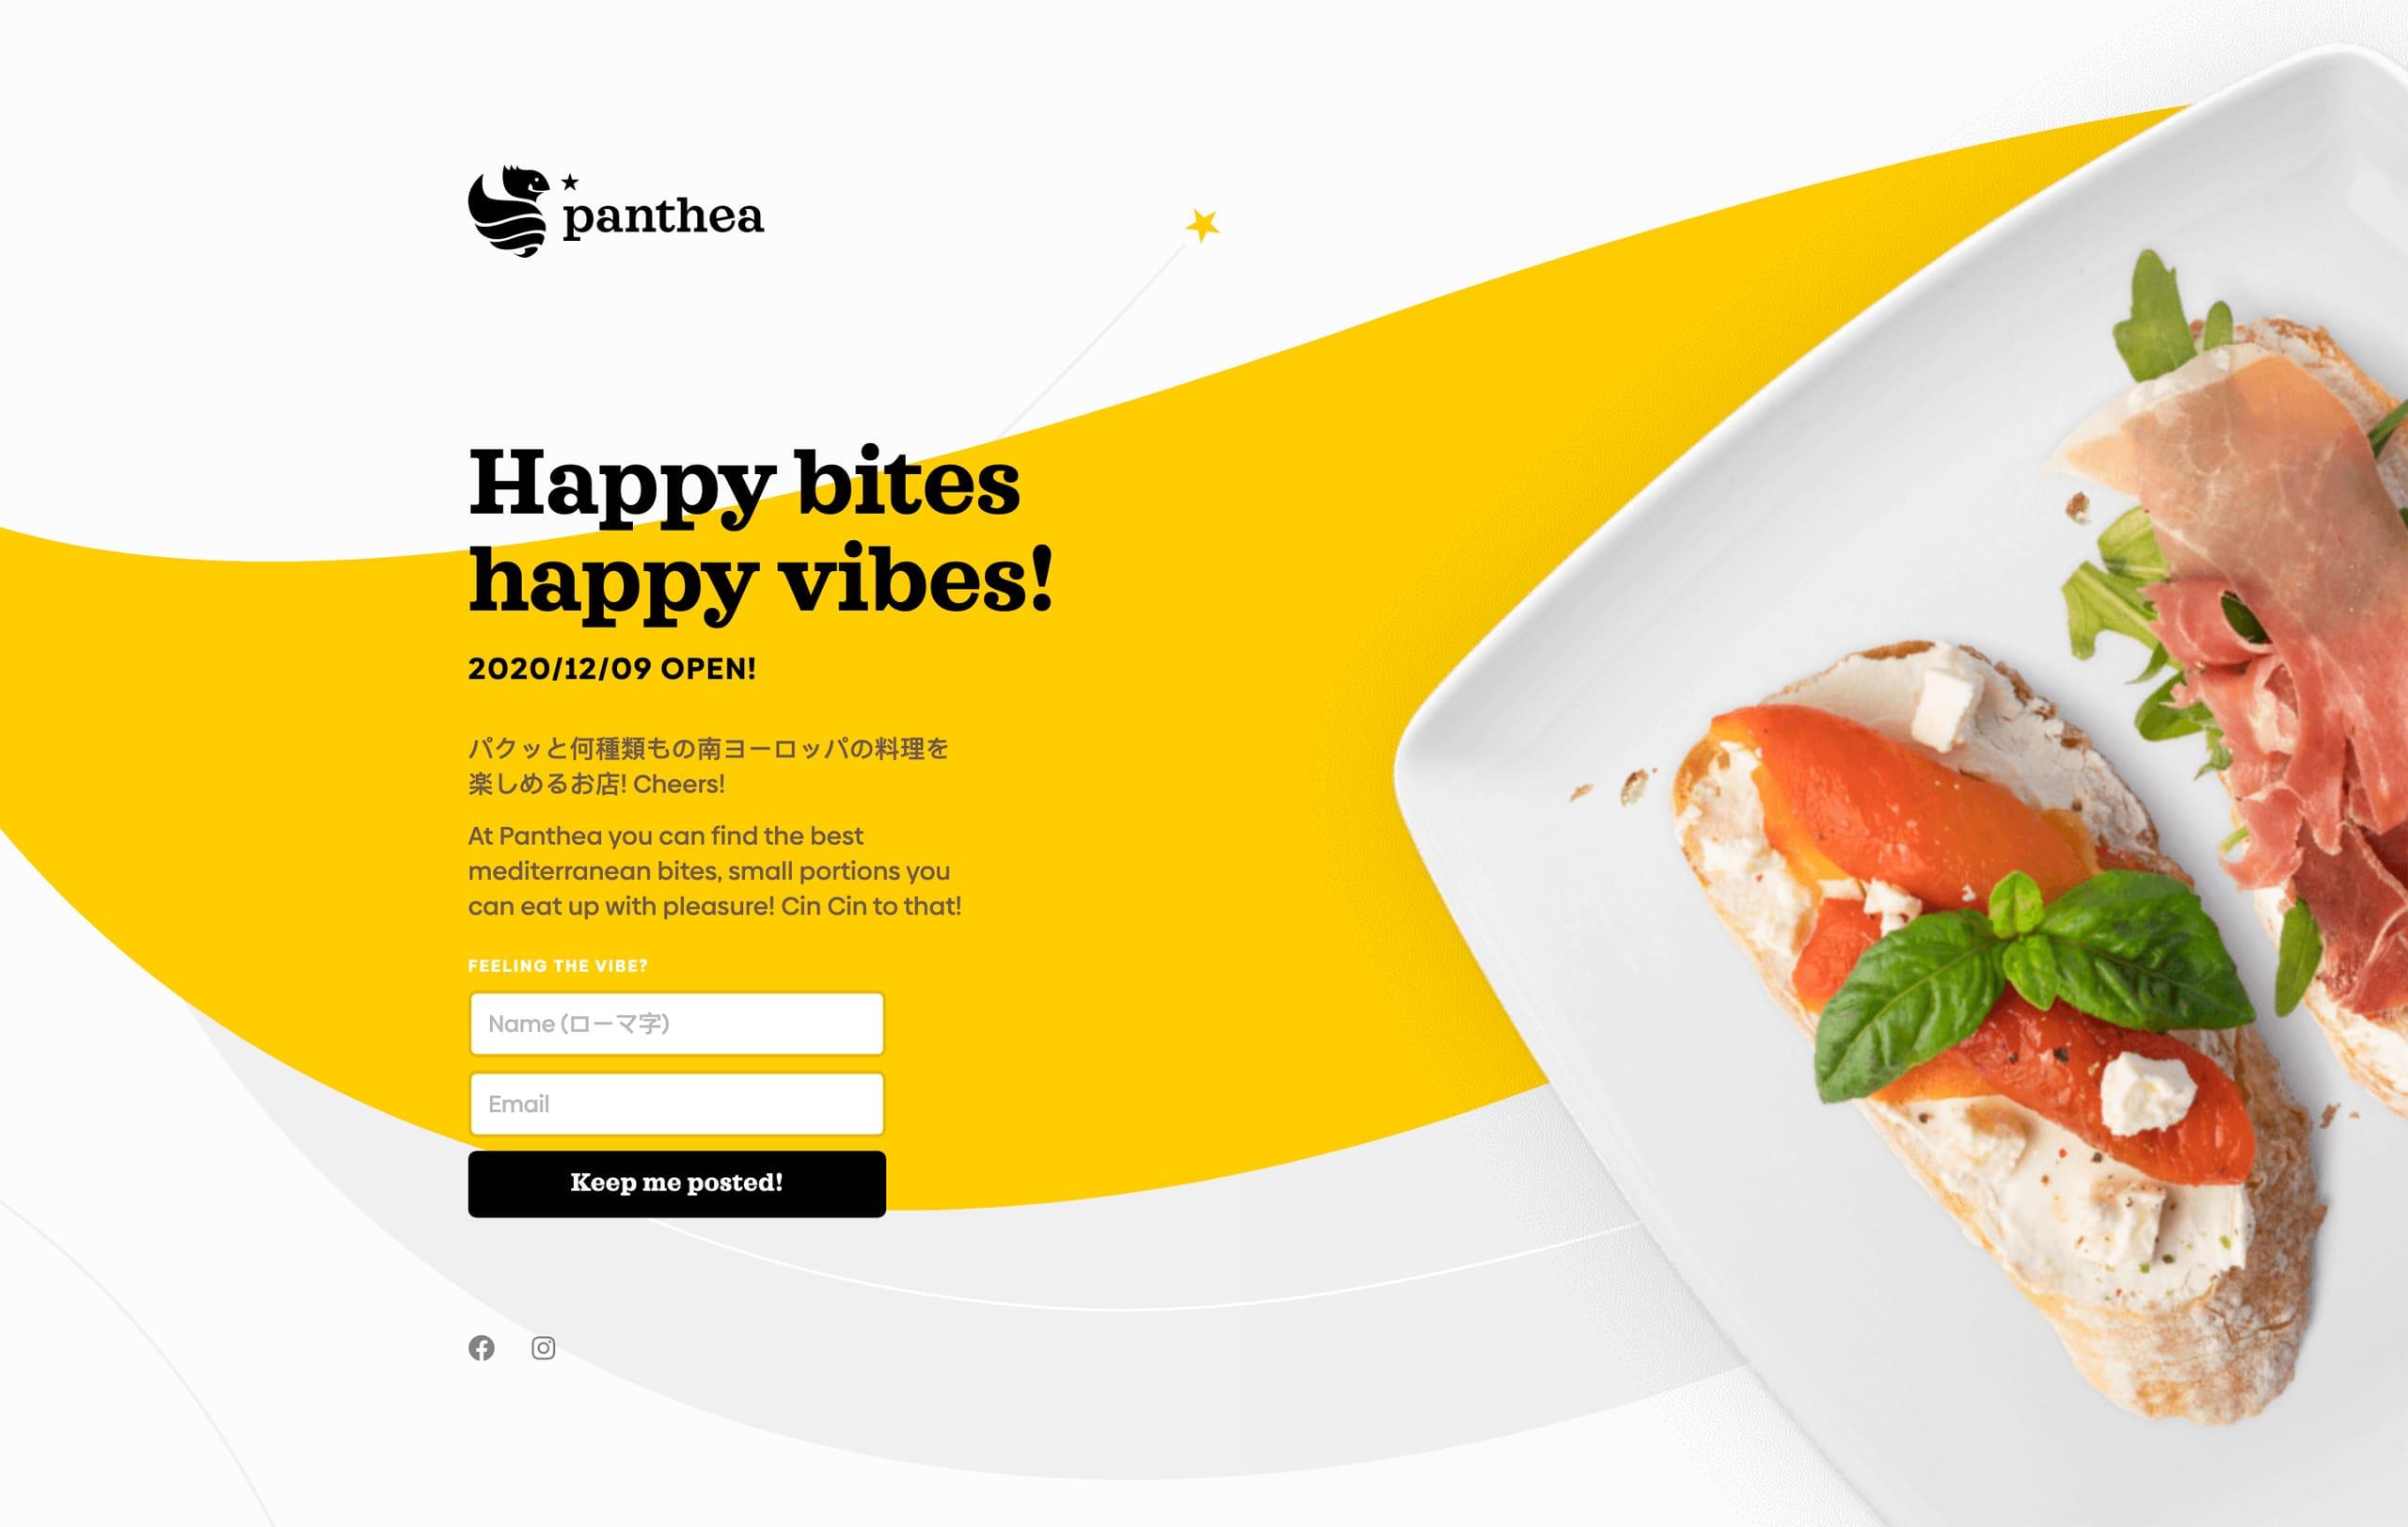 Panthea Website Screenshot